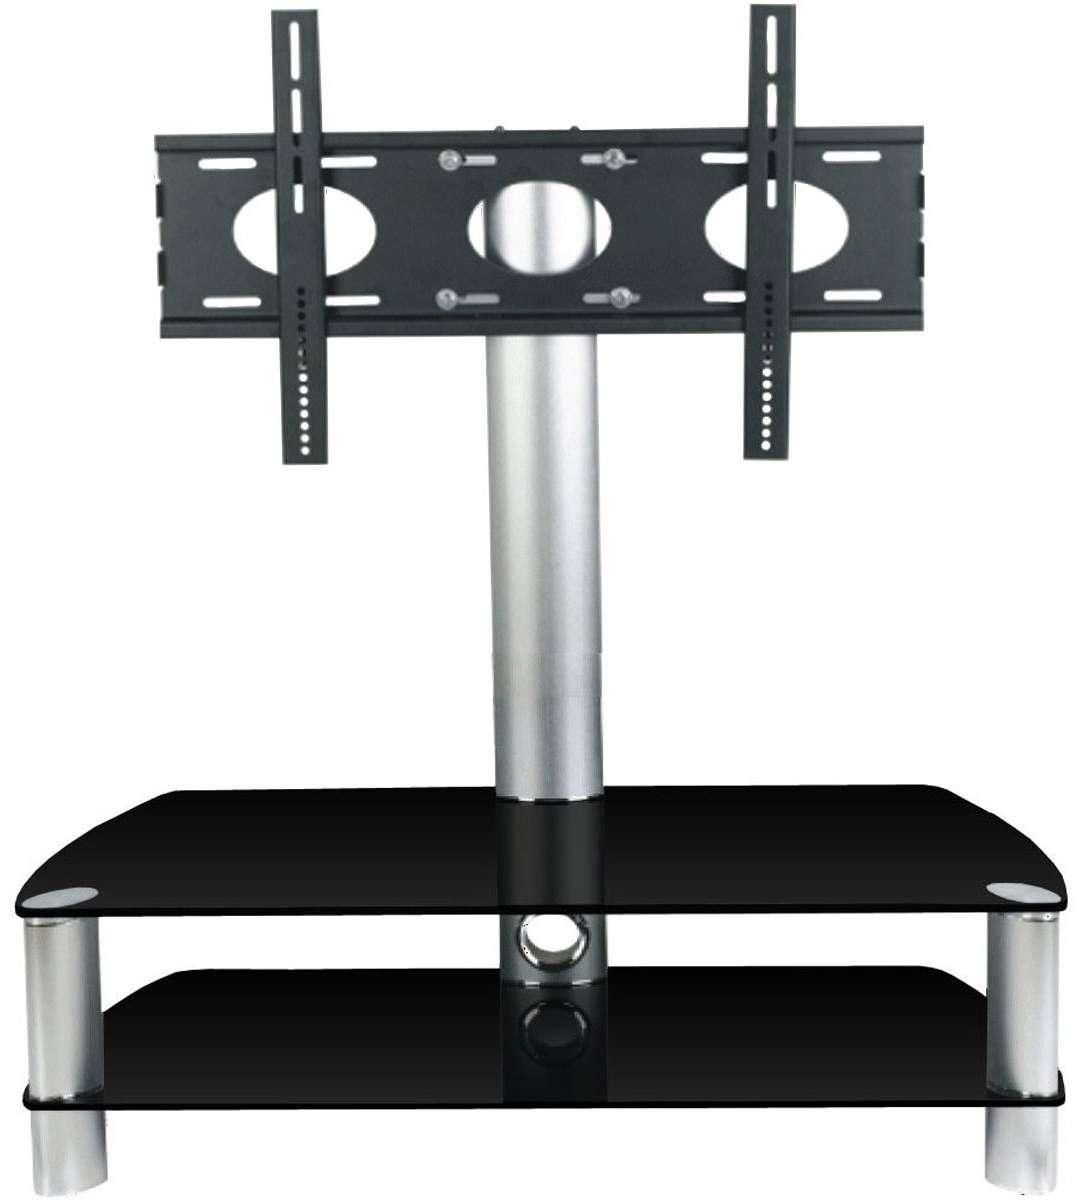 Stil Stand Stuk 2053Chbl Tv Stands In Stil Tv Stands (View 10 of 20)